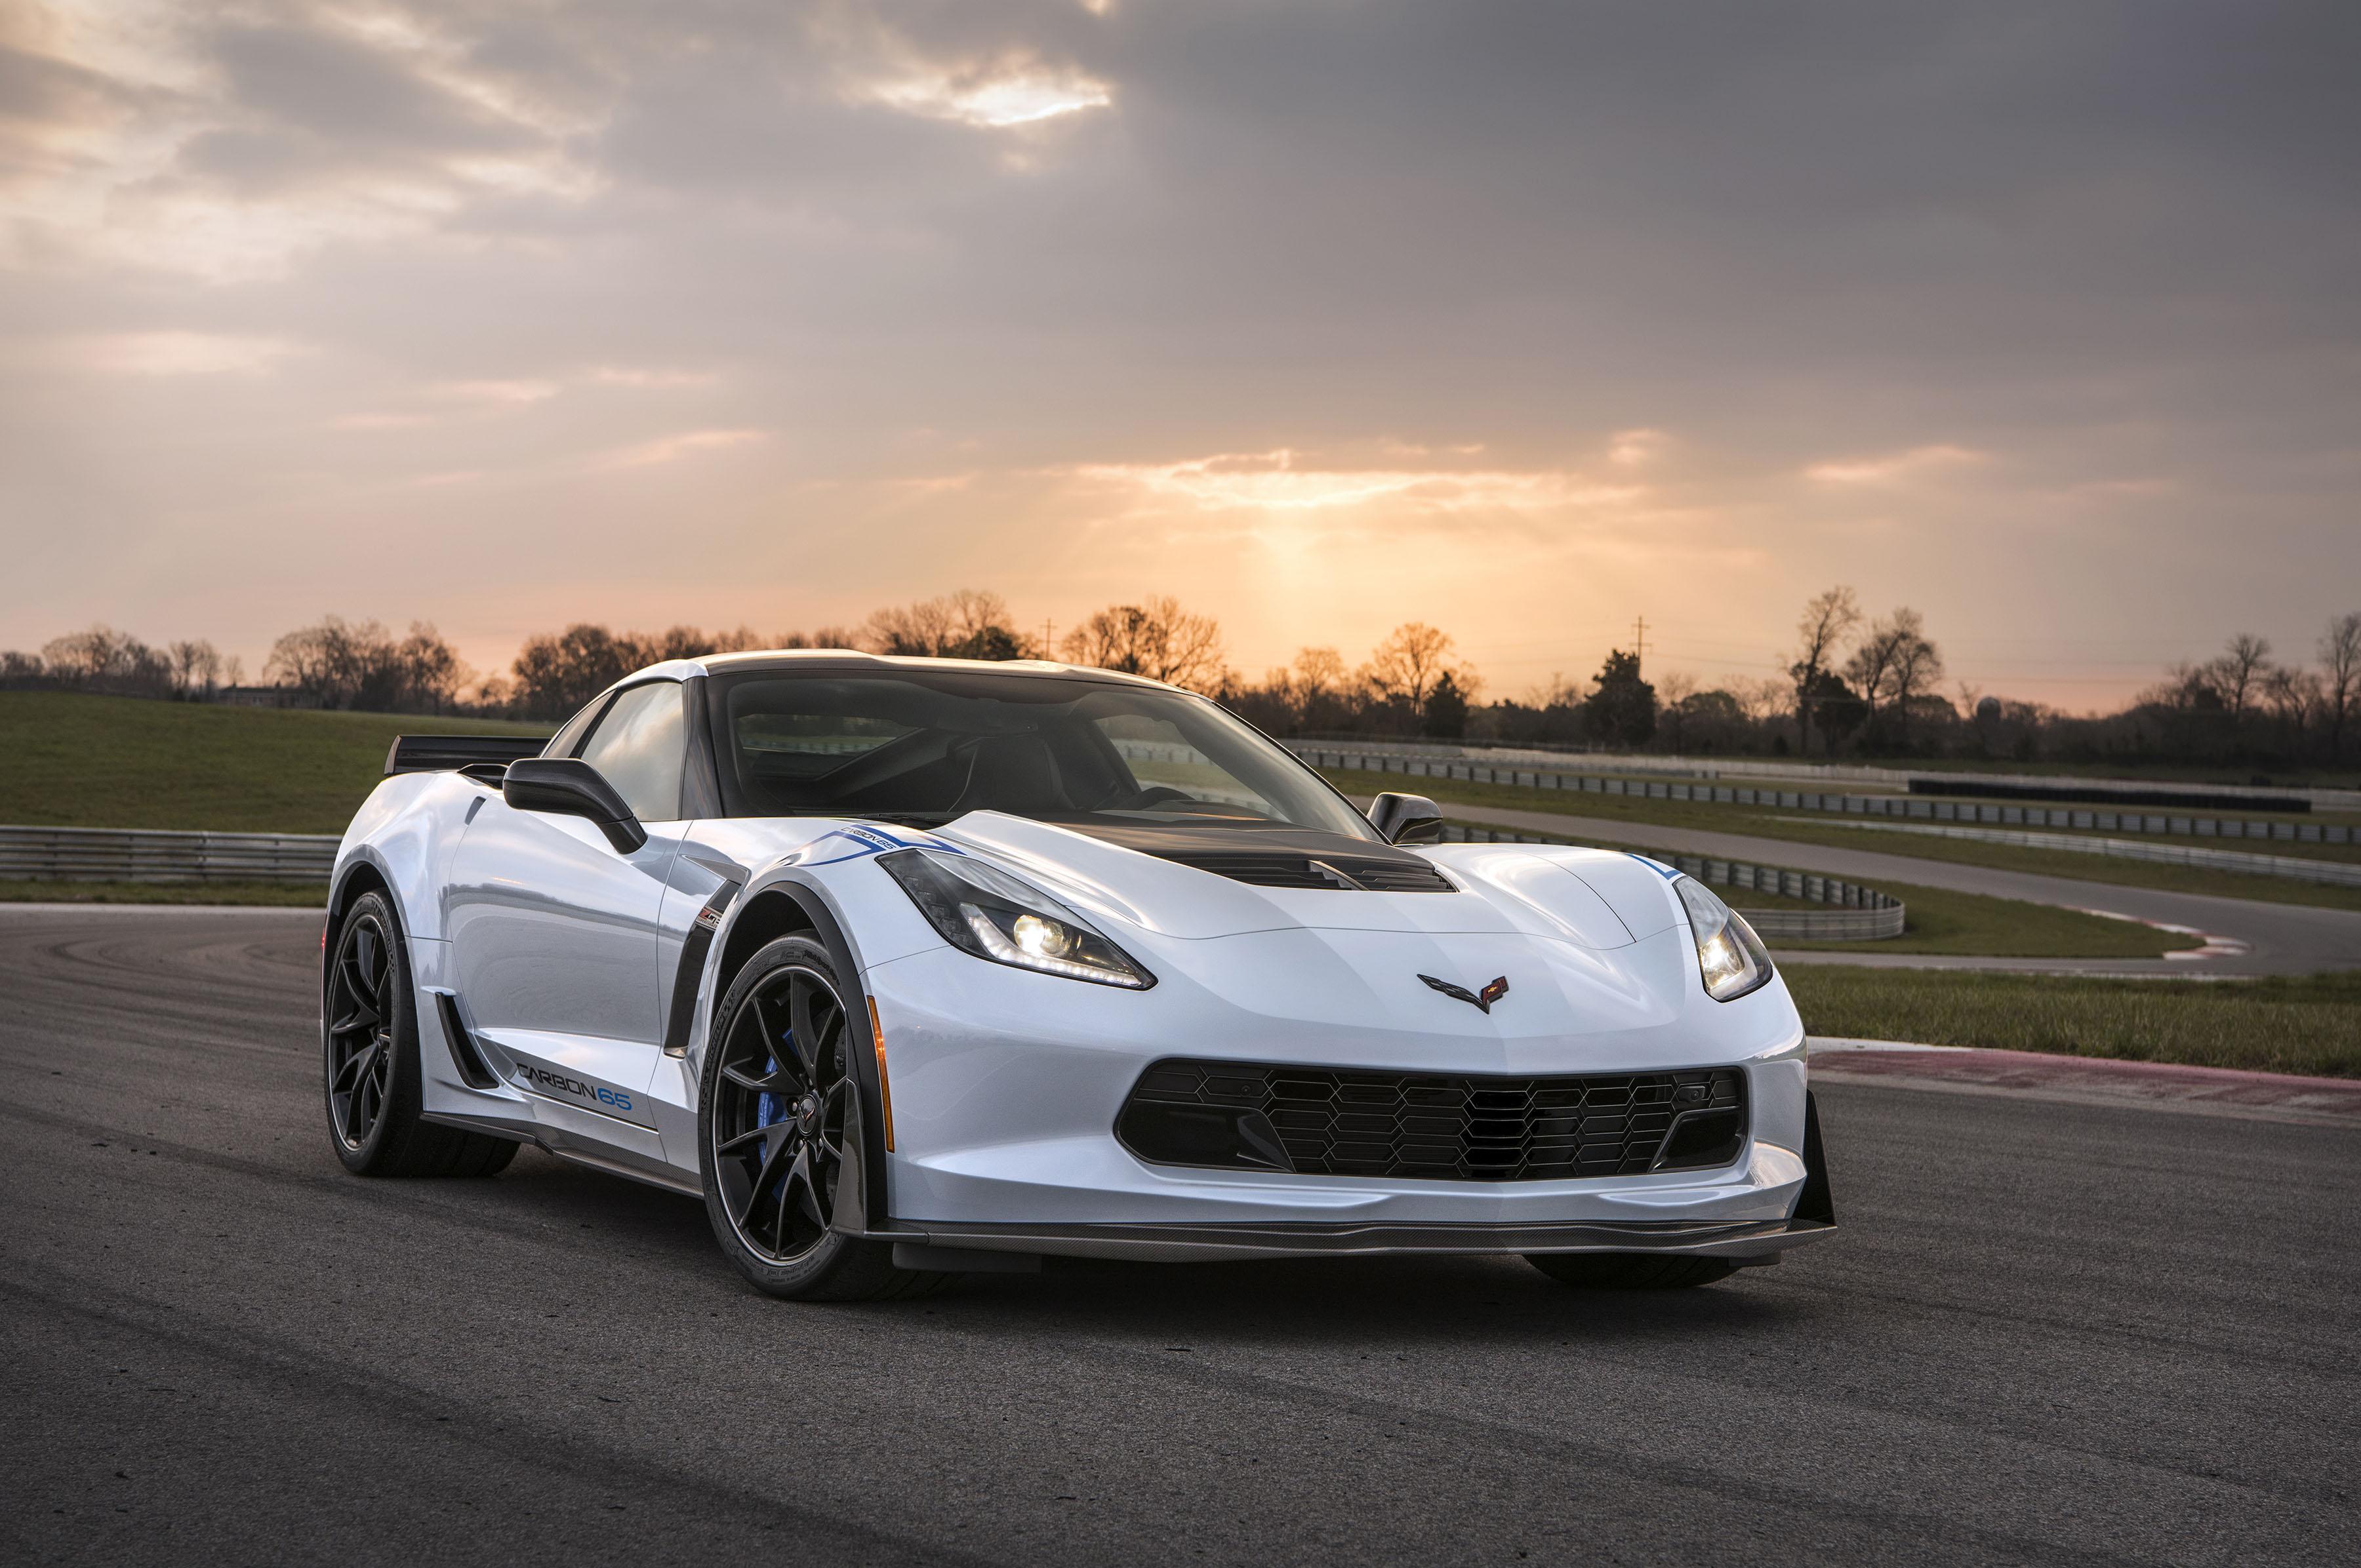 2018 Chevrolet Corvette Carbon 65 Phoenix Arizona